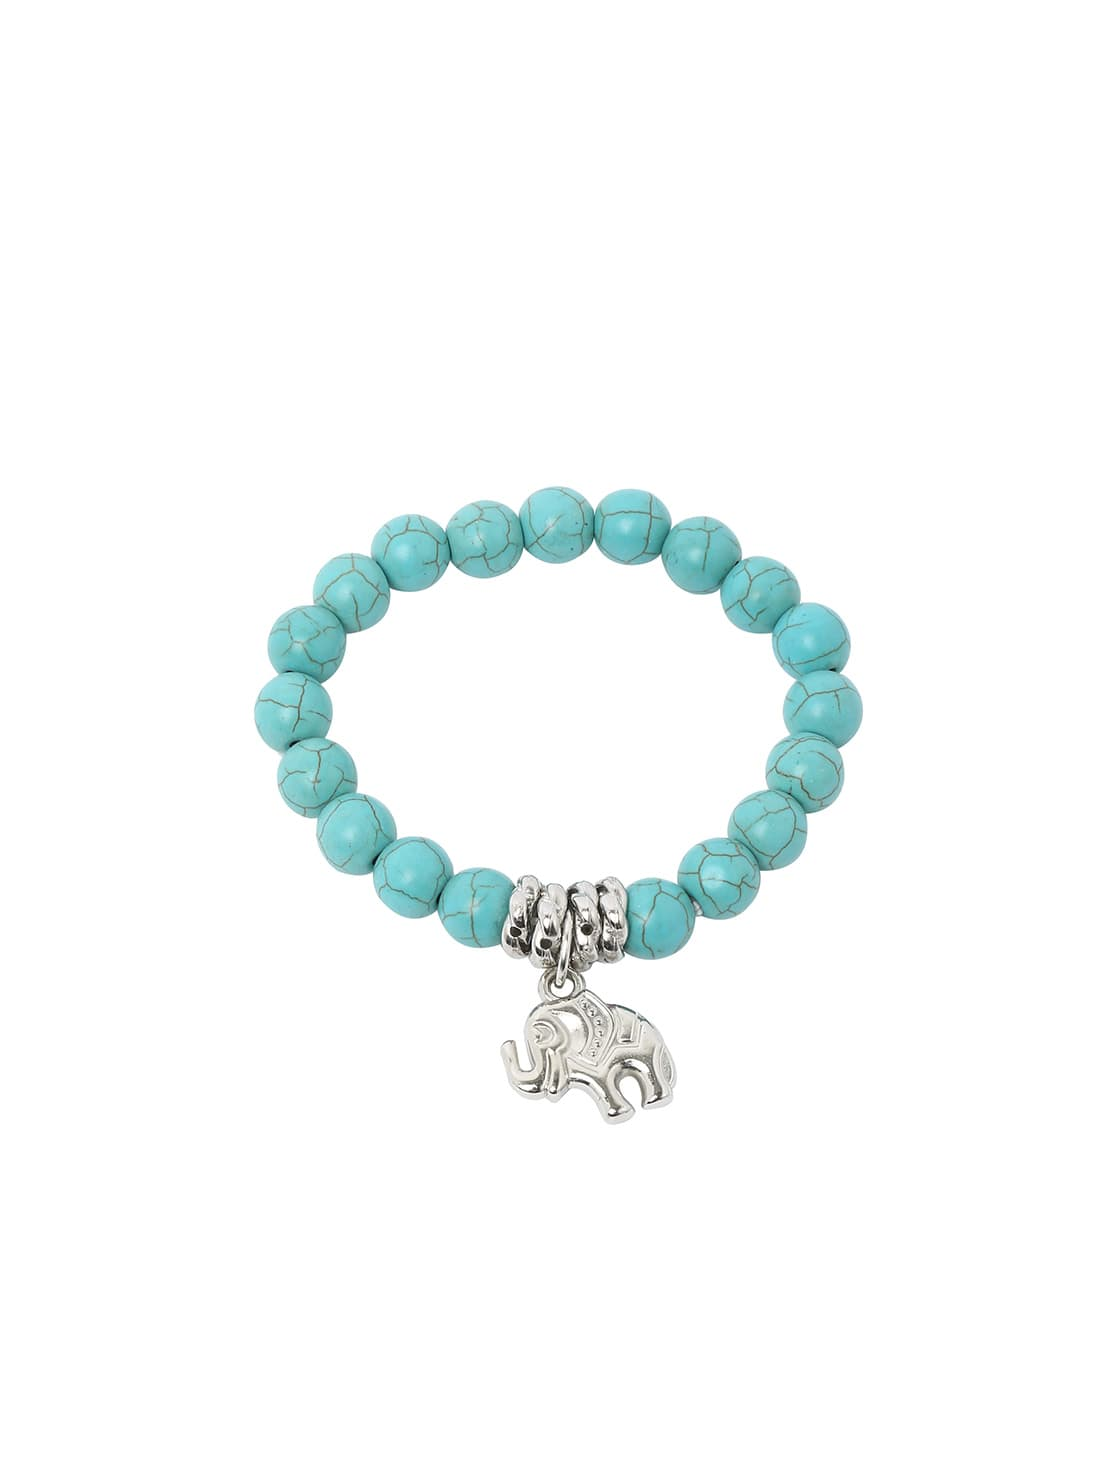 Turquoise Beads Silver Plated Elephant Bracelet все цены